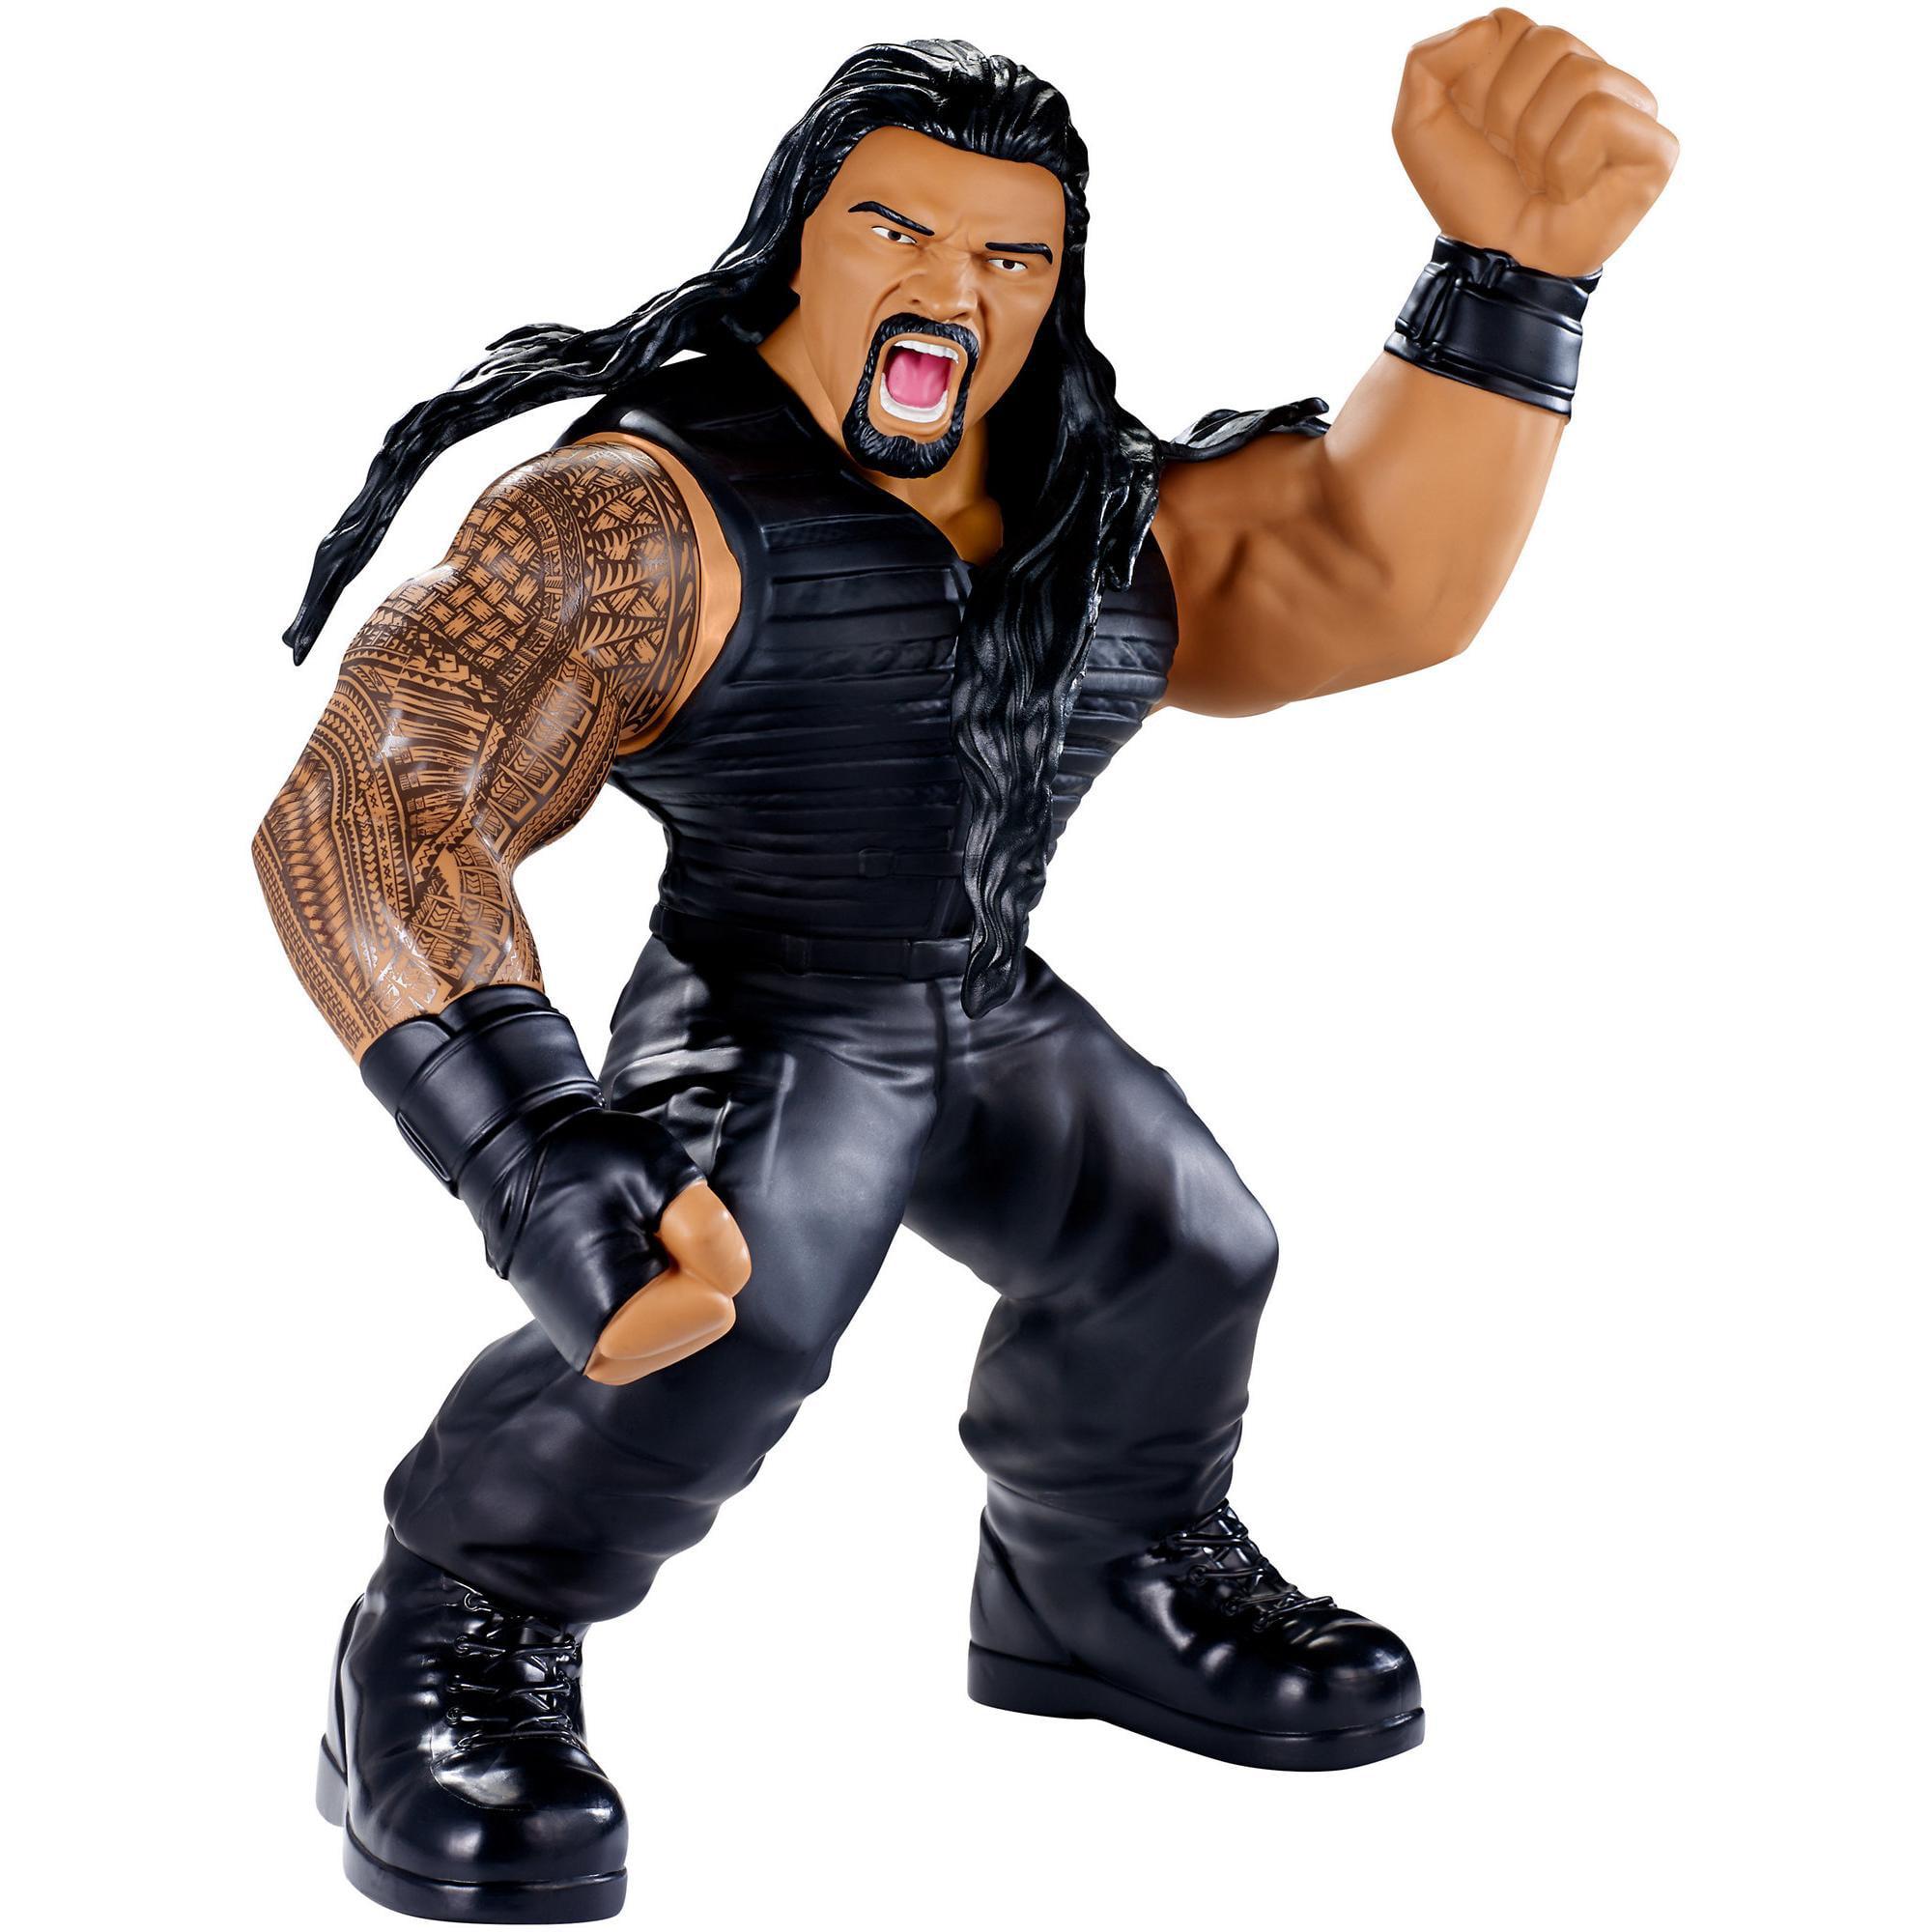 WWE Mattel Ric Flair Ventilateur Central Exclusive Basic Series 2 figure